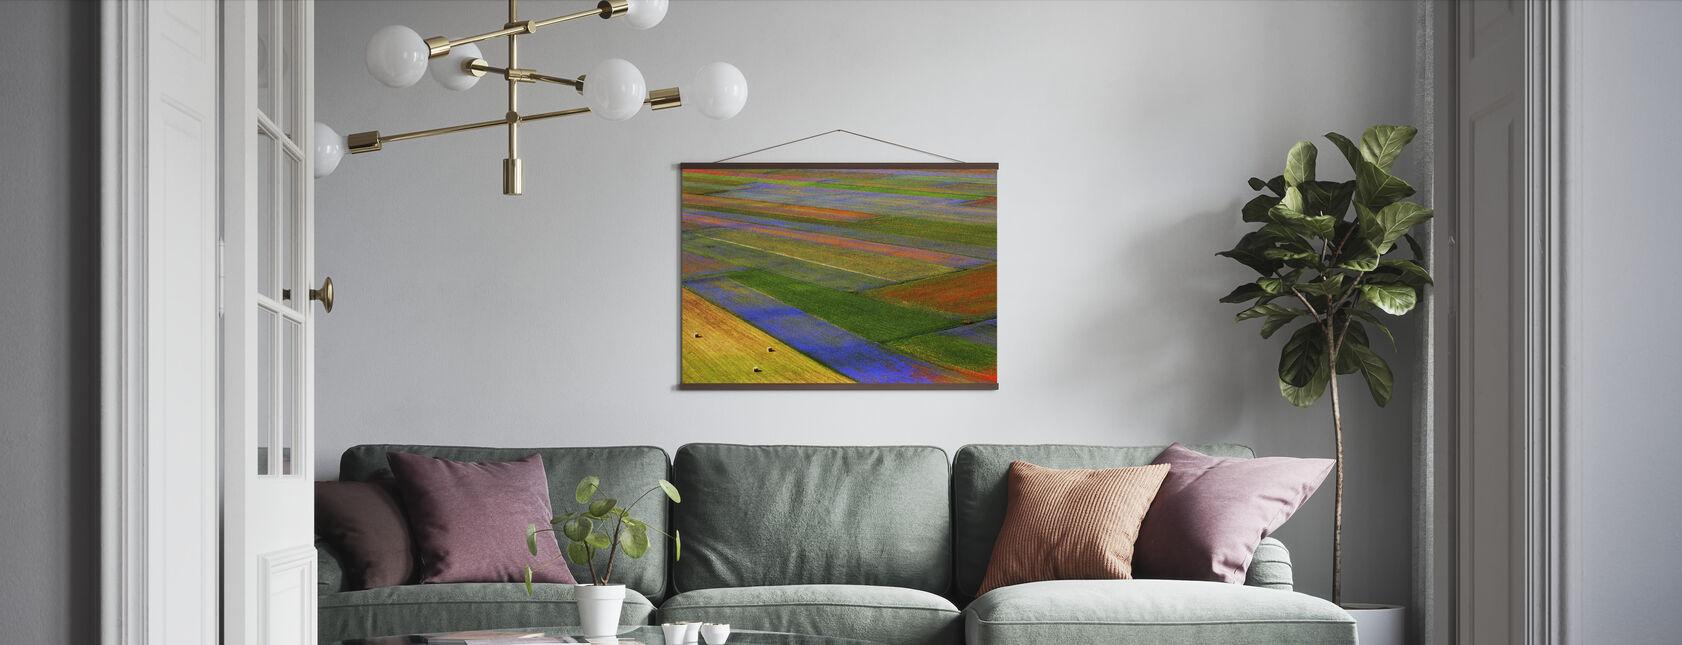 Färgglada fält - Poster - Vardagsrum